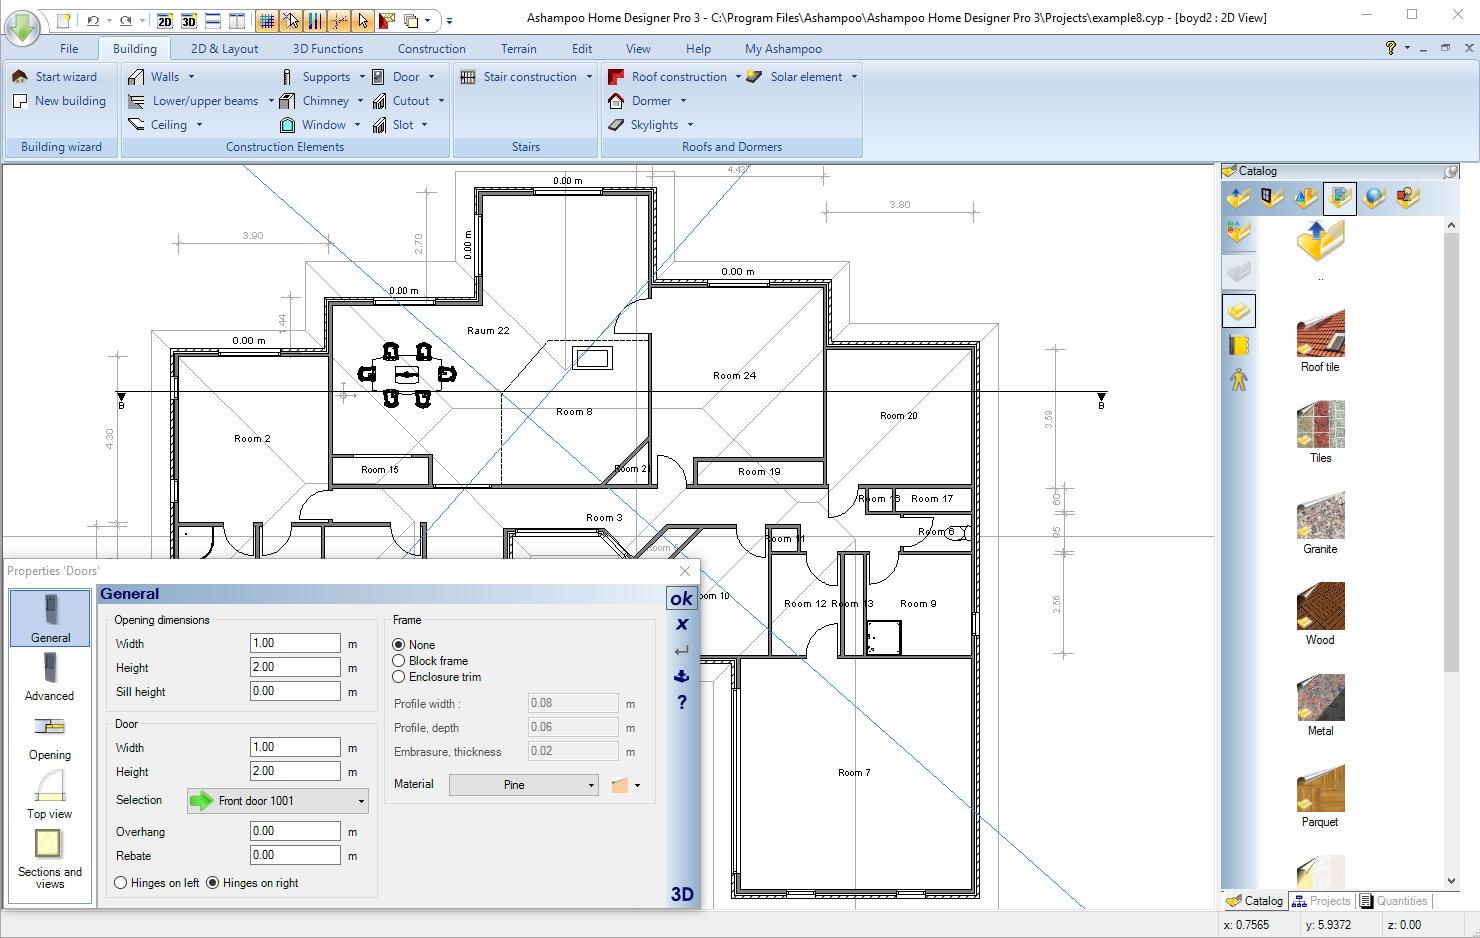 Ashampoo Home Designer Pro 3 [Download]: Amazon.co.uk: on nero cover designer, pepakura designer, home and in fashoin retailers logos, home show, home designer suite, home dj, book designer,